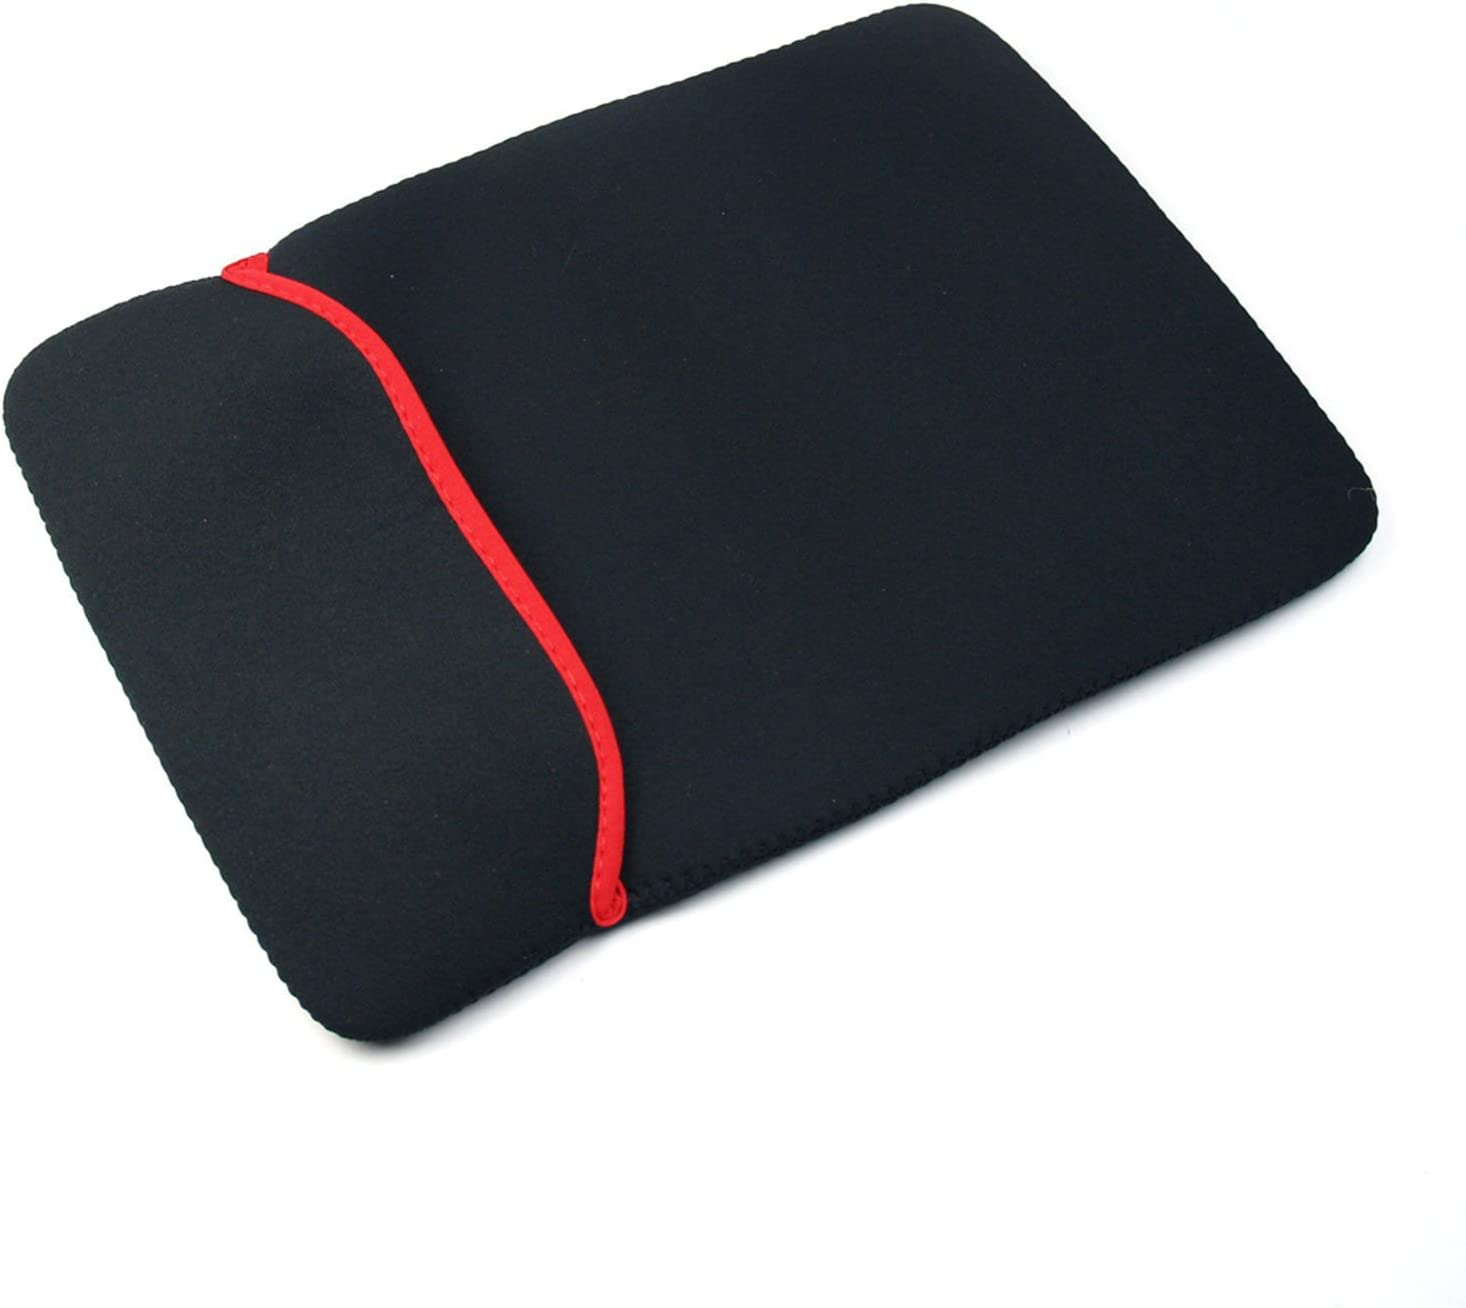 Soft Laptop Sleeve Ultra-Cheap Deals Bag Pouch Case For 1 8